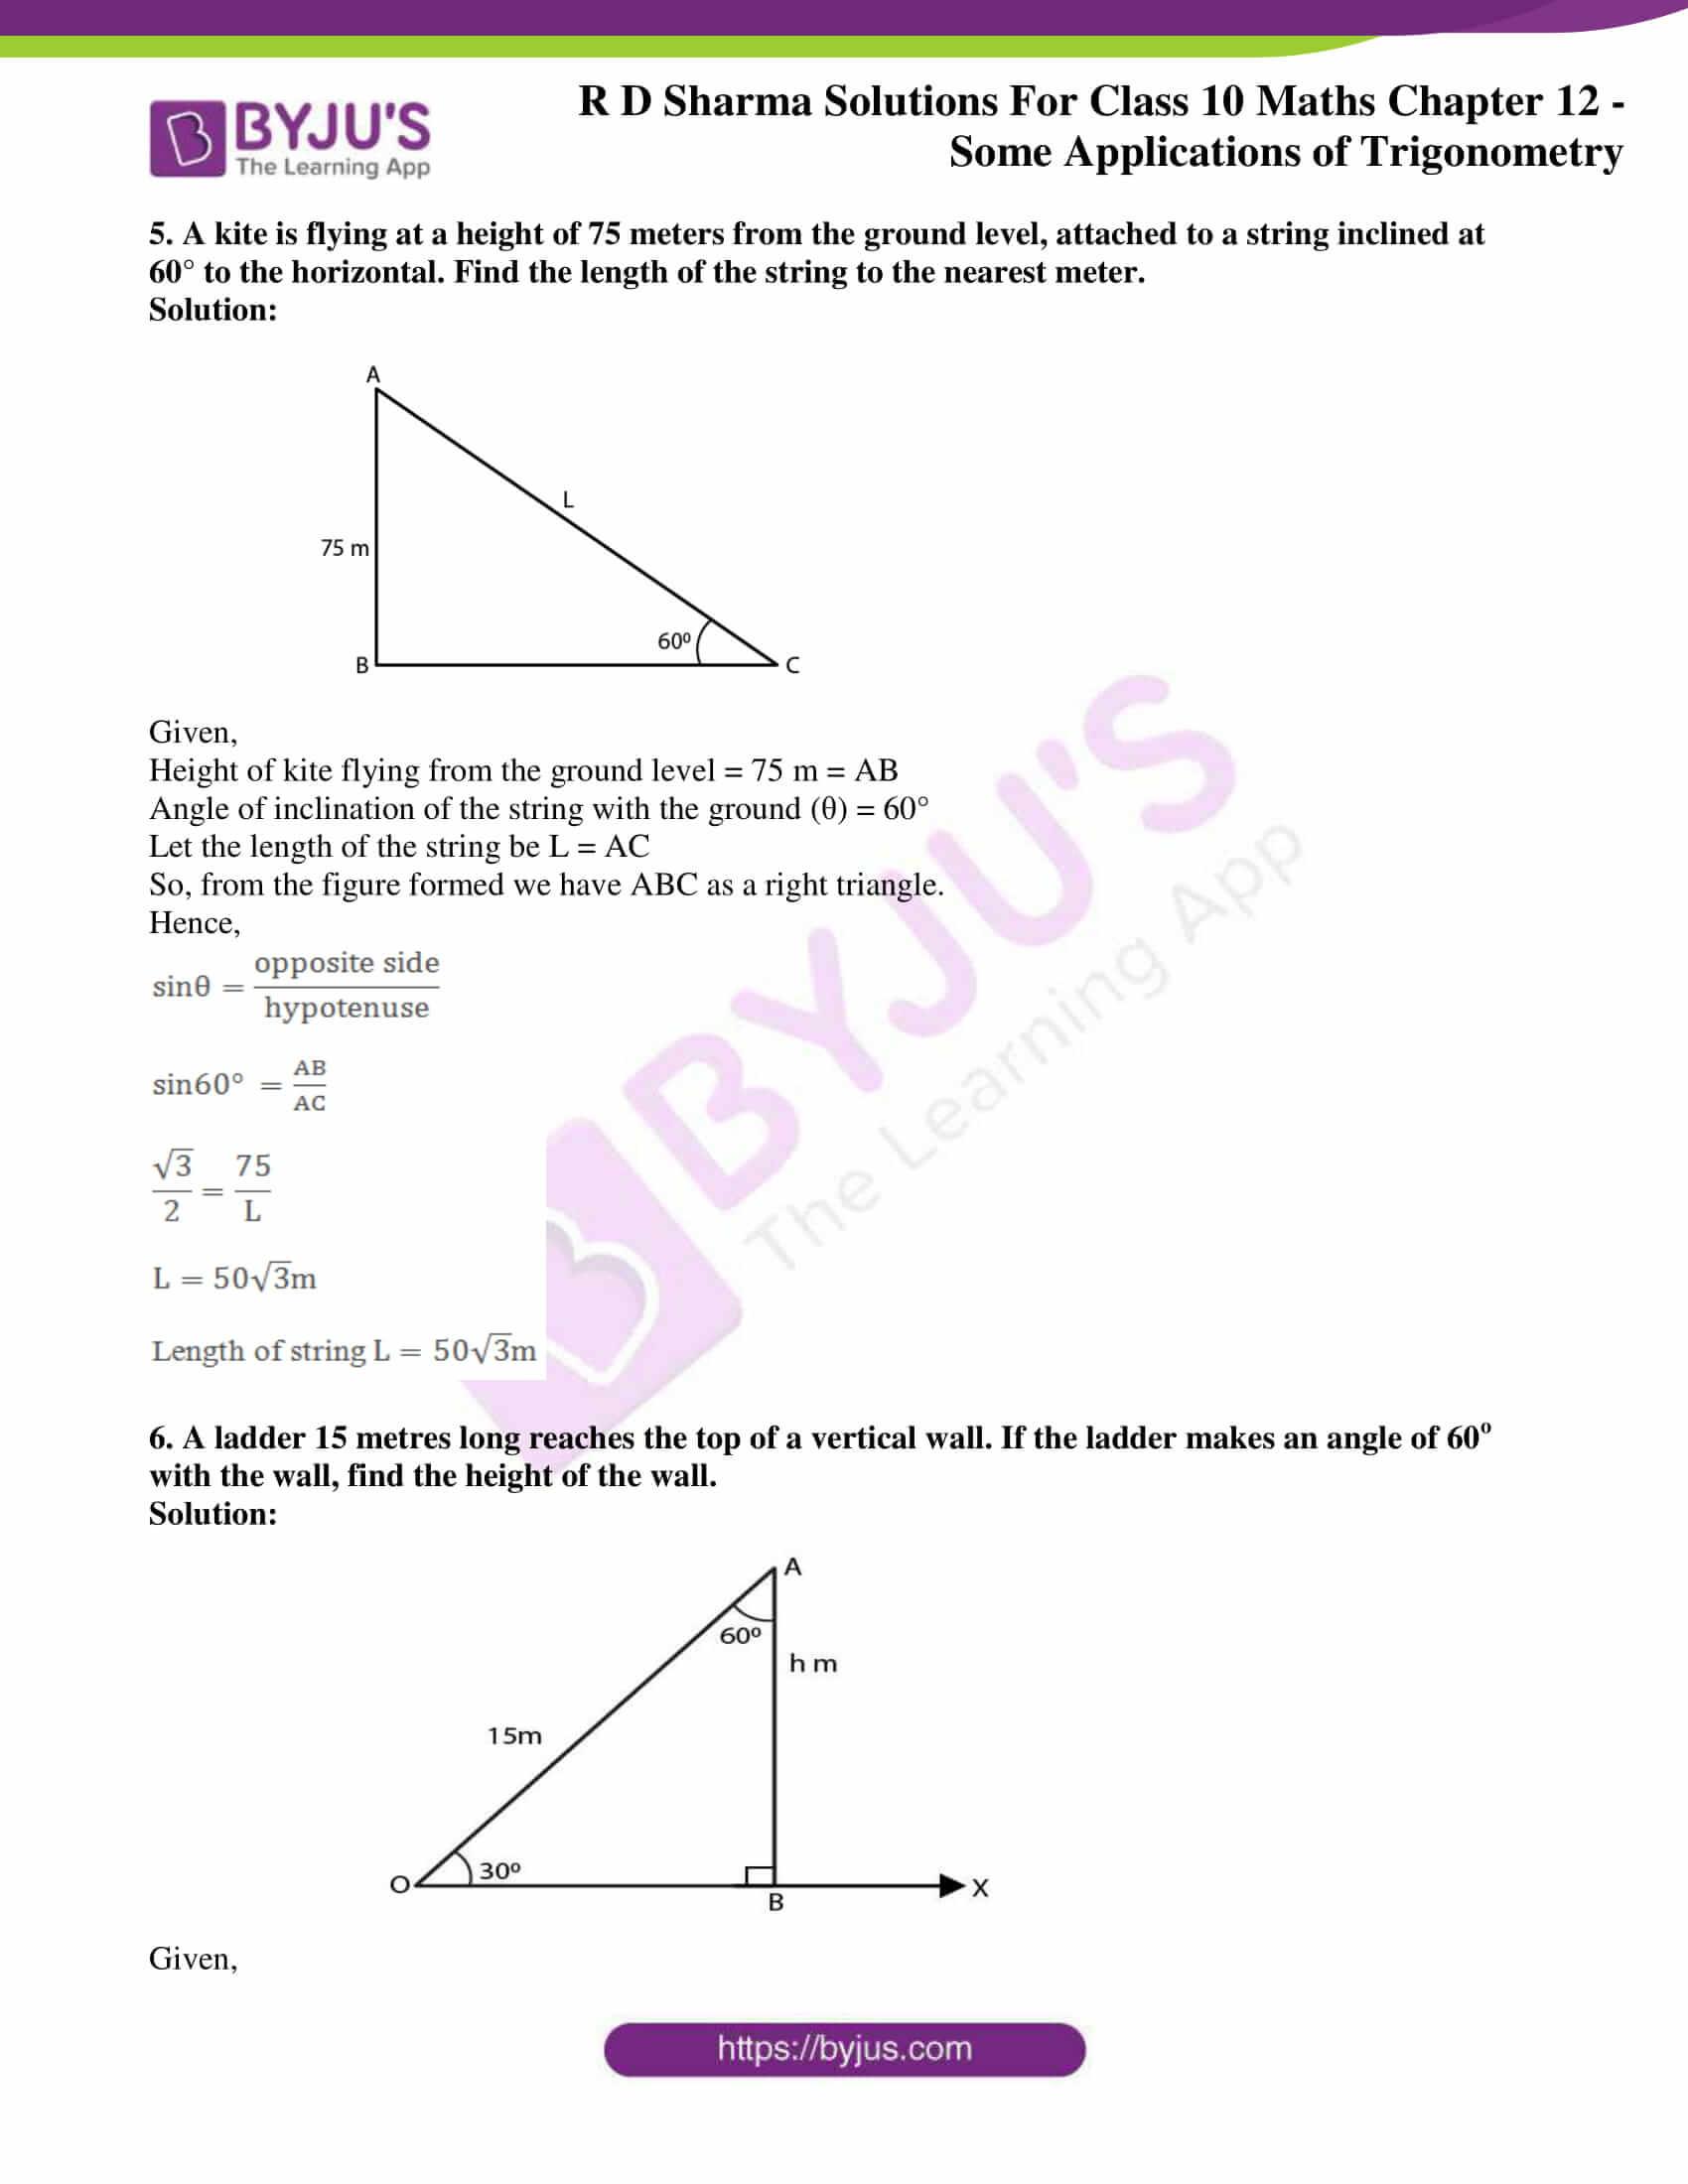 rd sharma class 10 chapter 12 applications trigonometry solutions 04